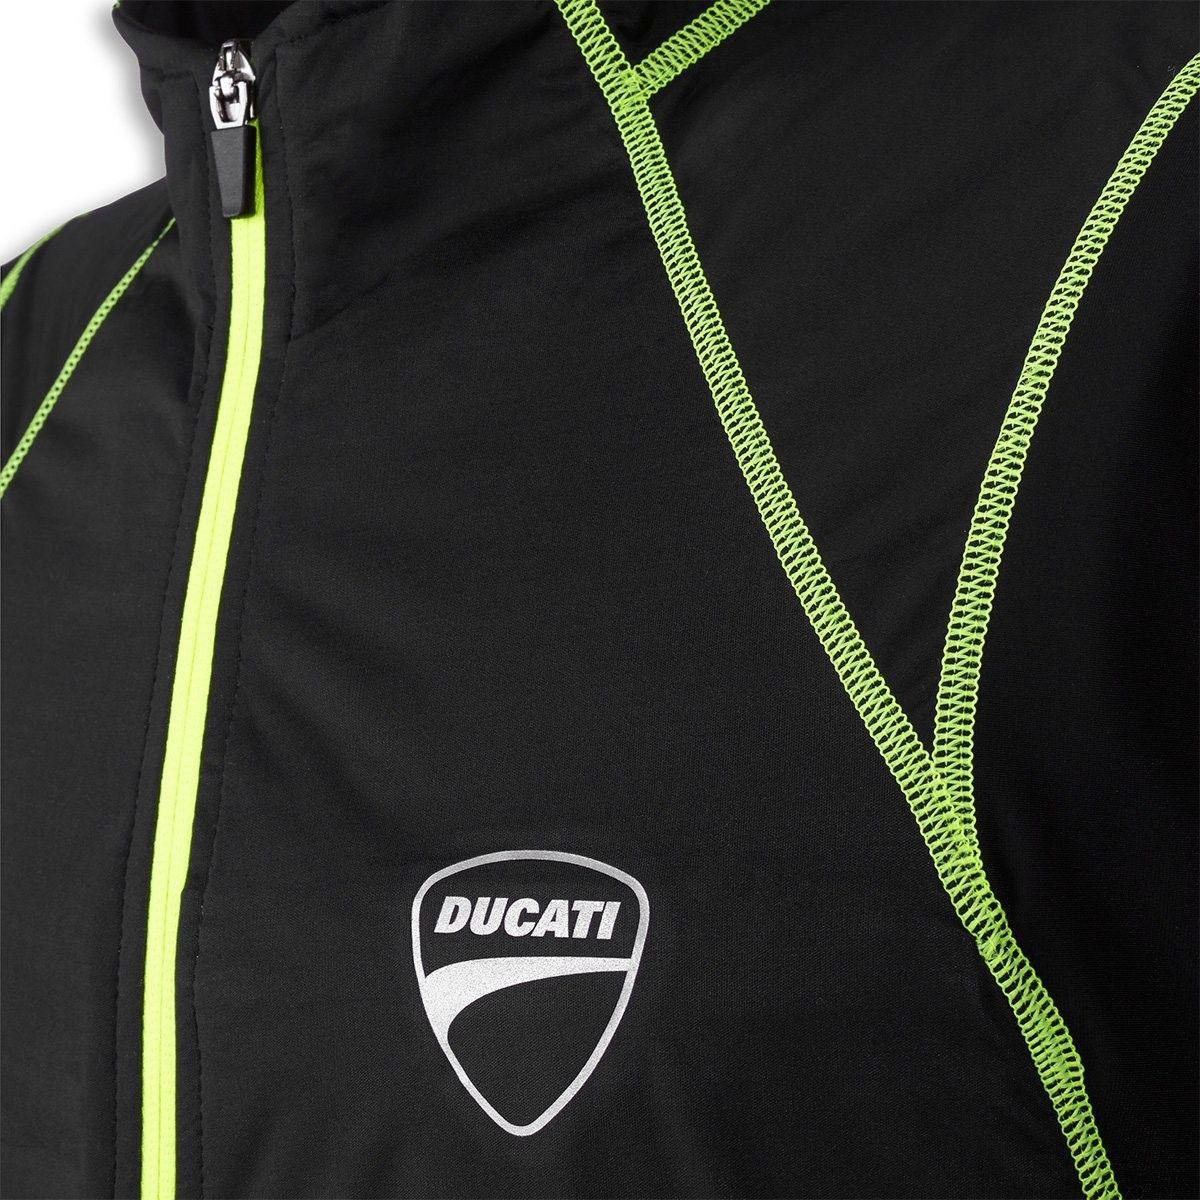 【DUCATI performance】D-Active 防風背心 - 「Webike-摩托百貨」